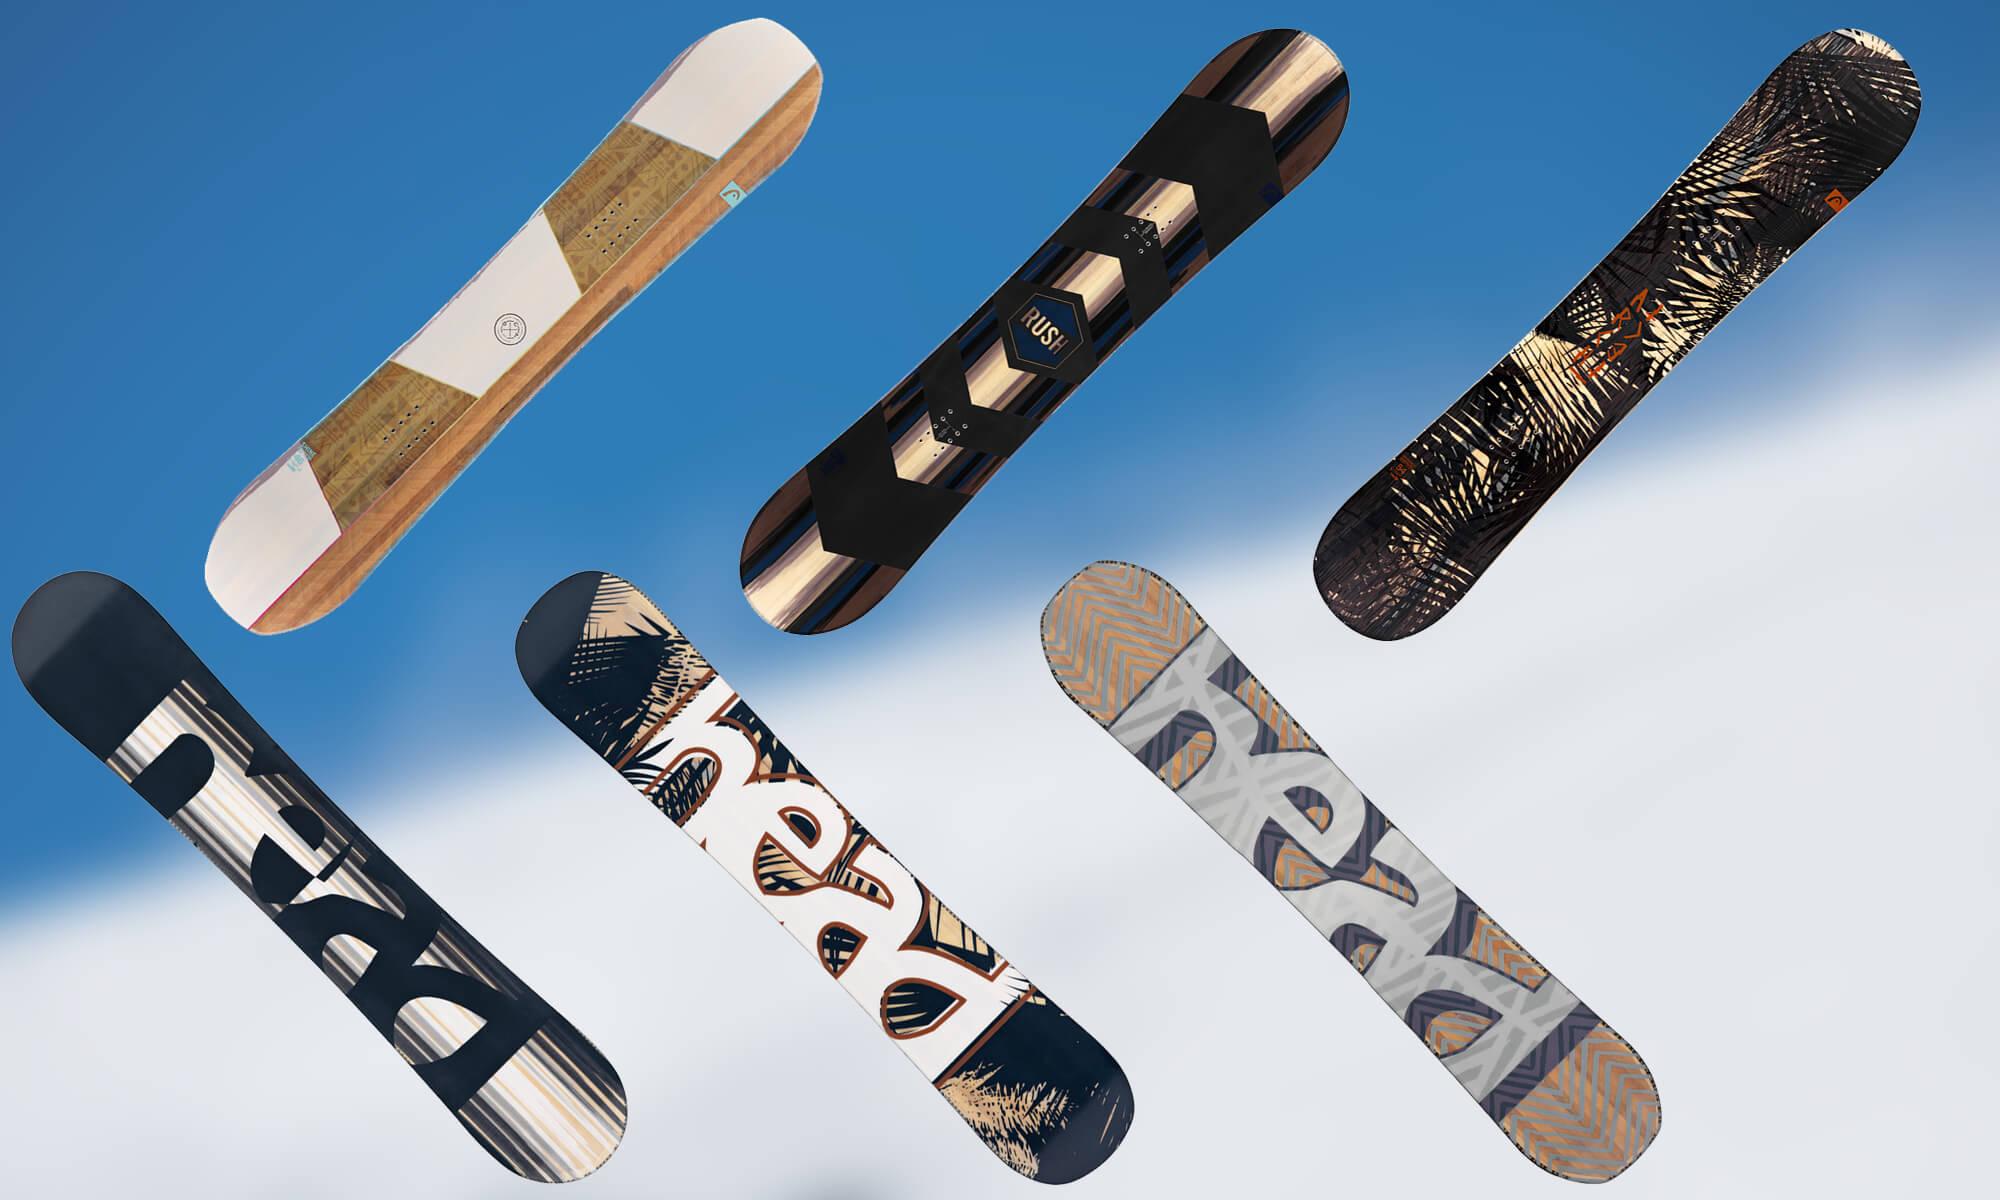 Ski-Sport-Stadl-Berlin-Snowboard